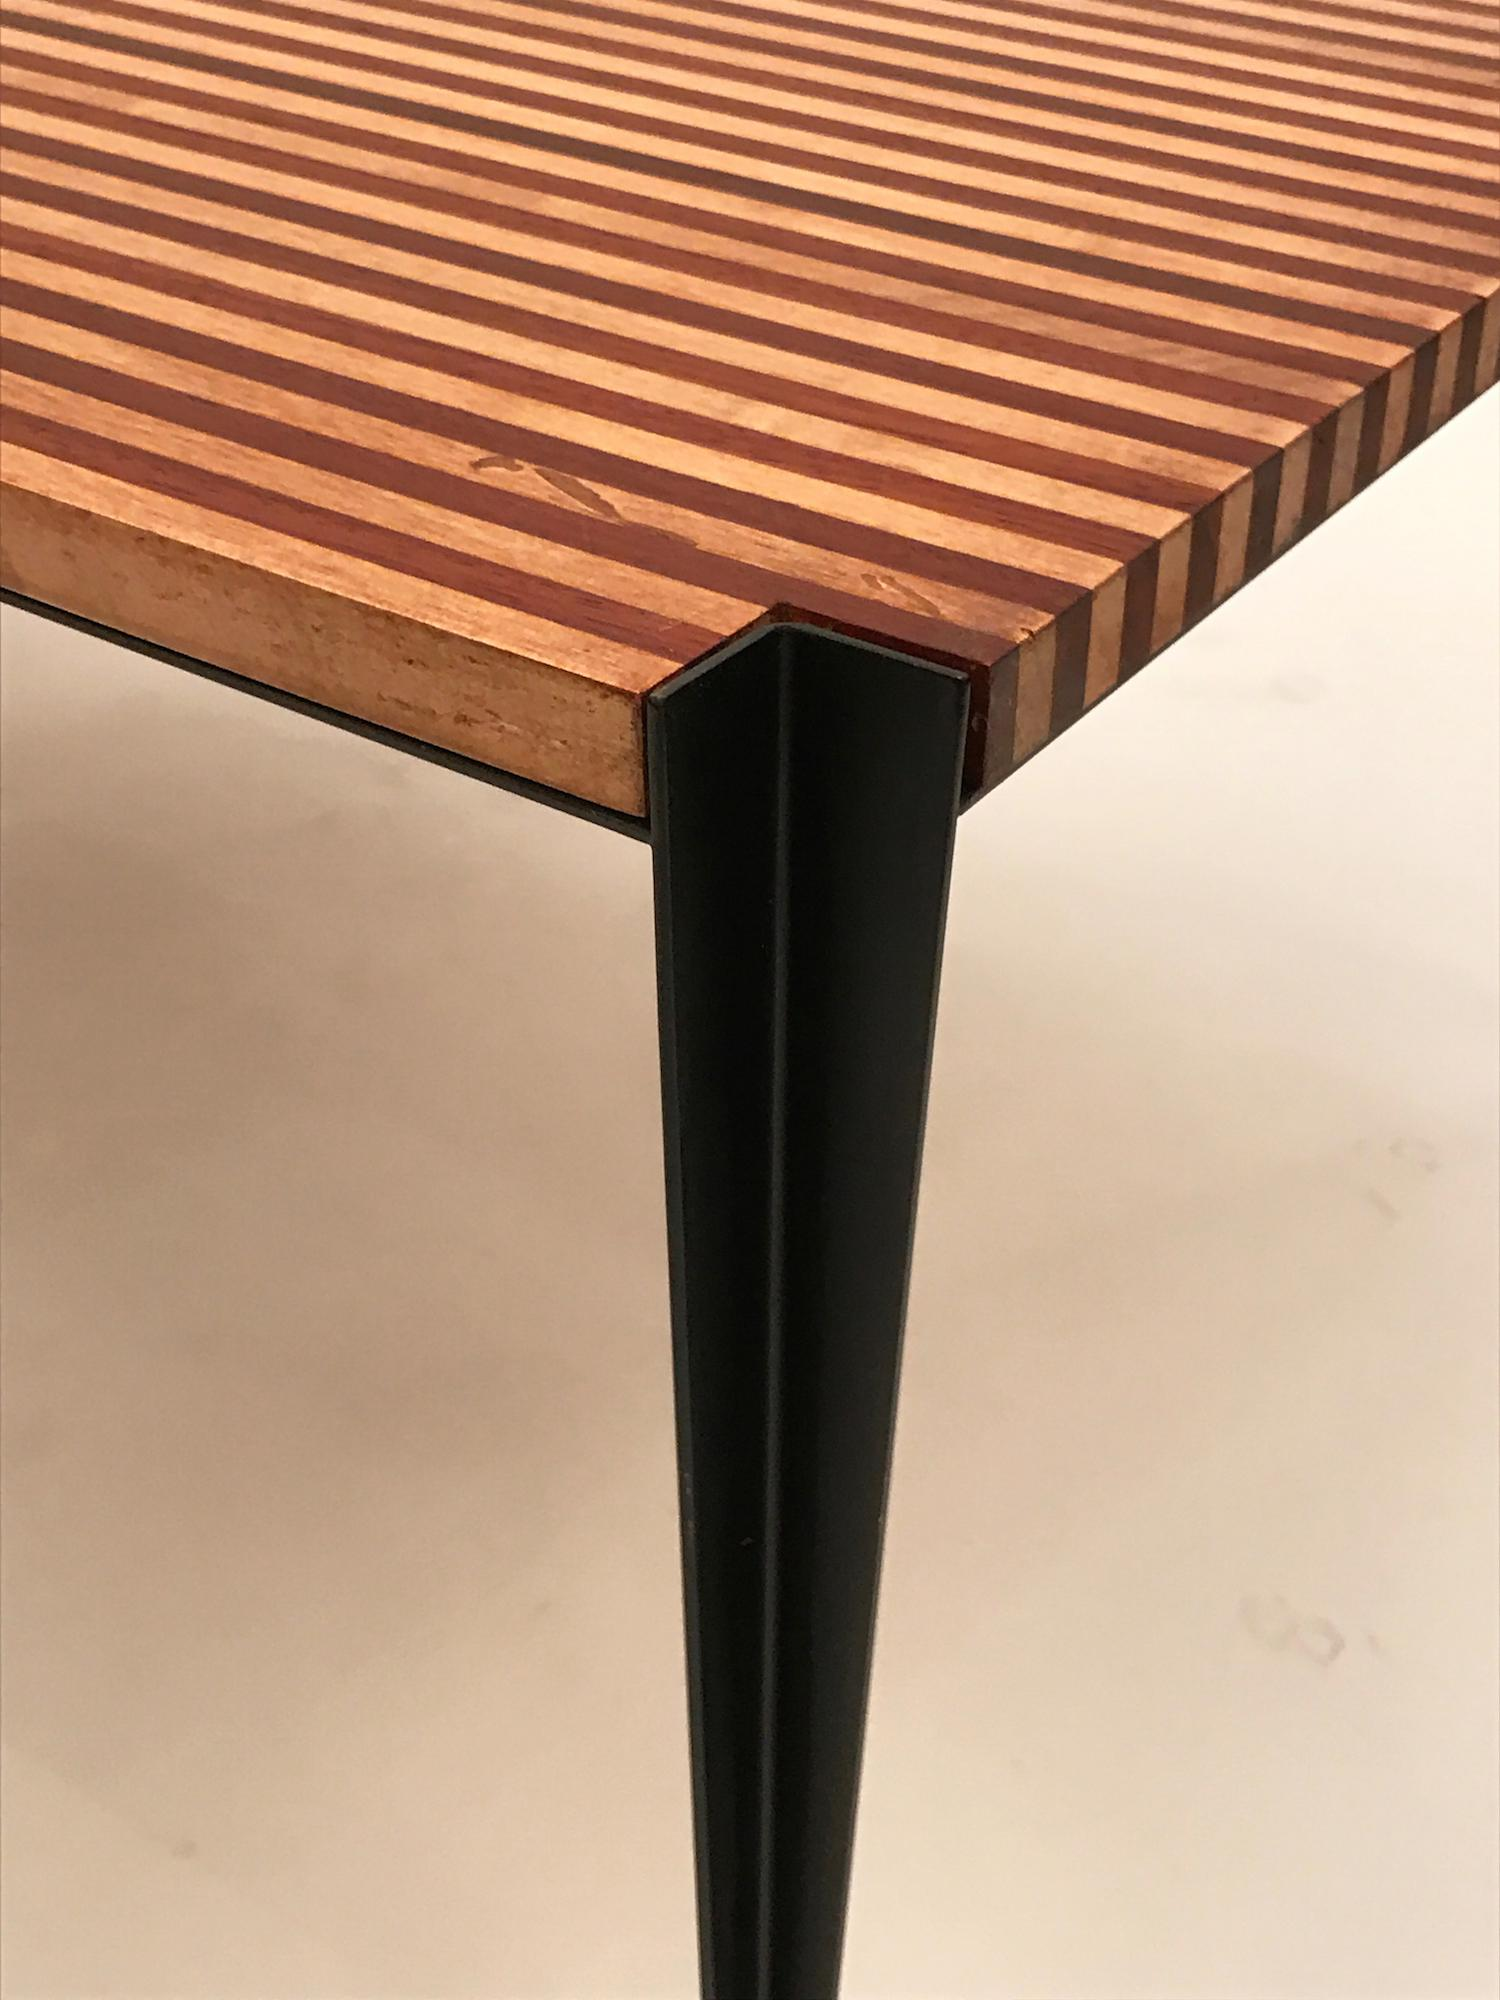 Osvaldo Borsani Osvaldo Borsani Pair Of Large Cocktail Tables In Two Toned  Wood And Steel For